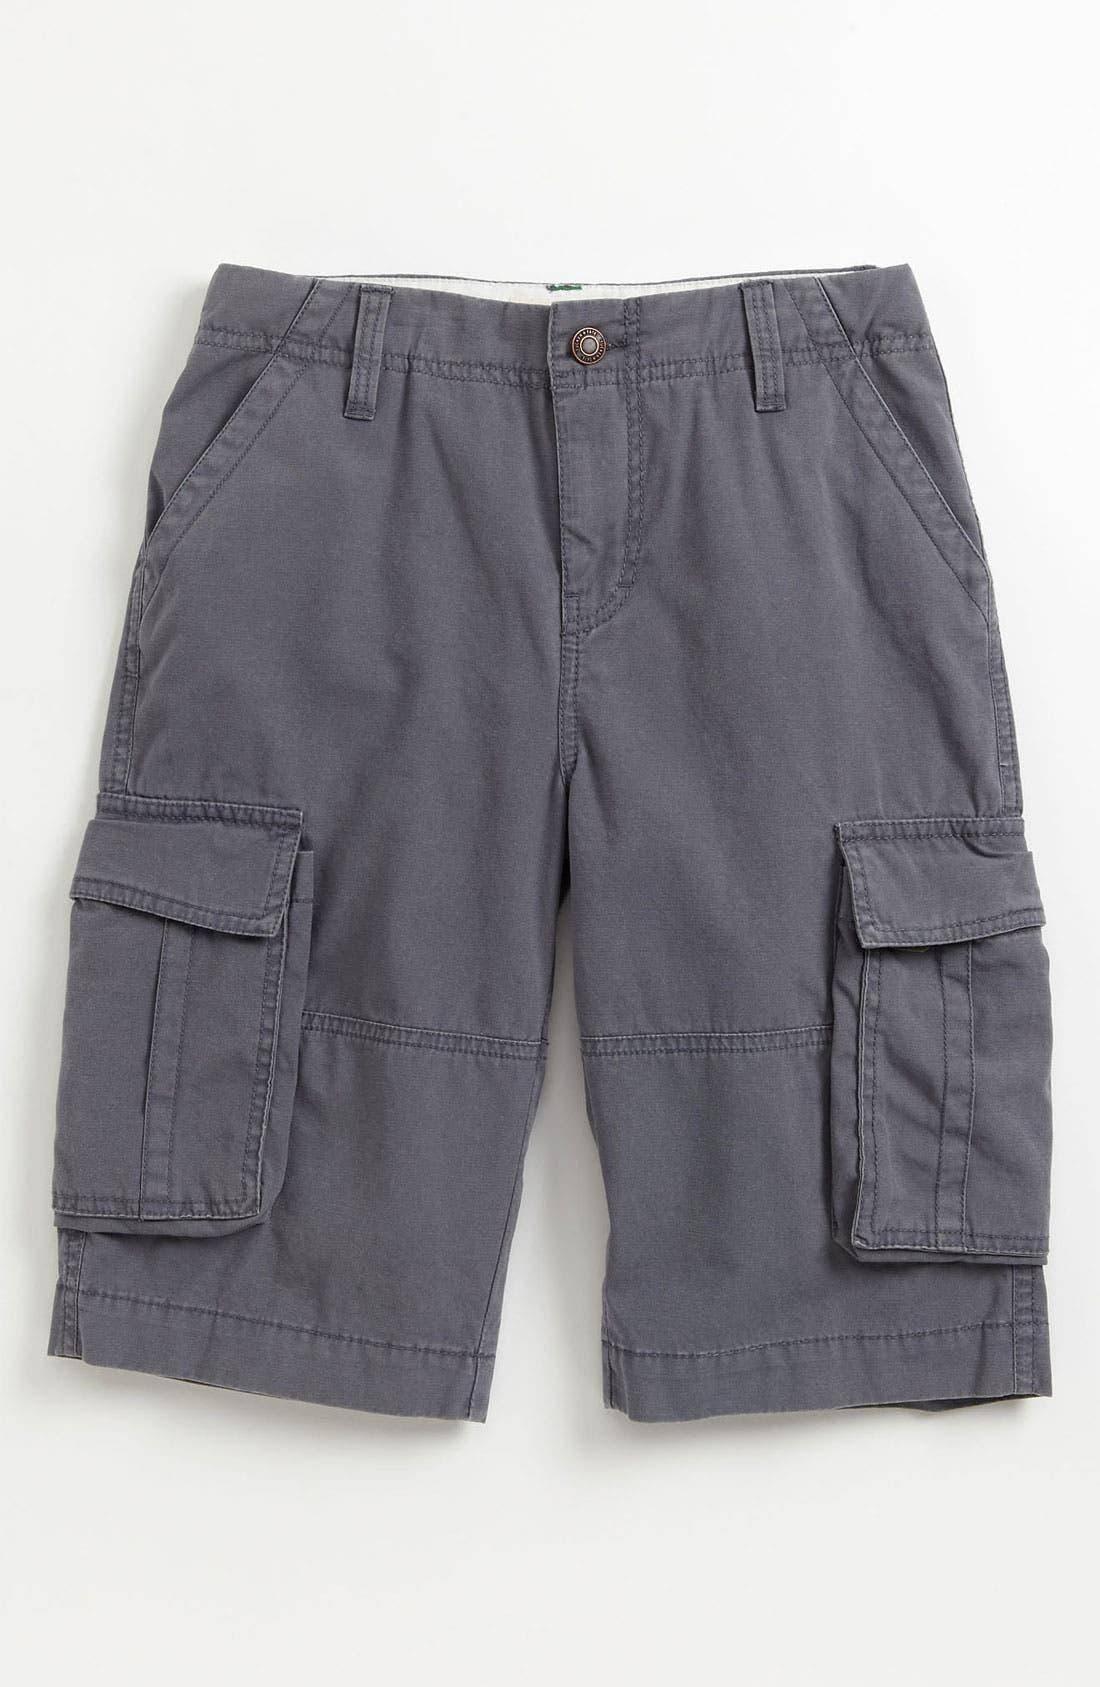 Alternate Image 1 Selected - Tucker + Tate Cargo Shorts (Toddler)